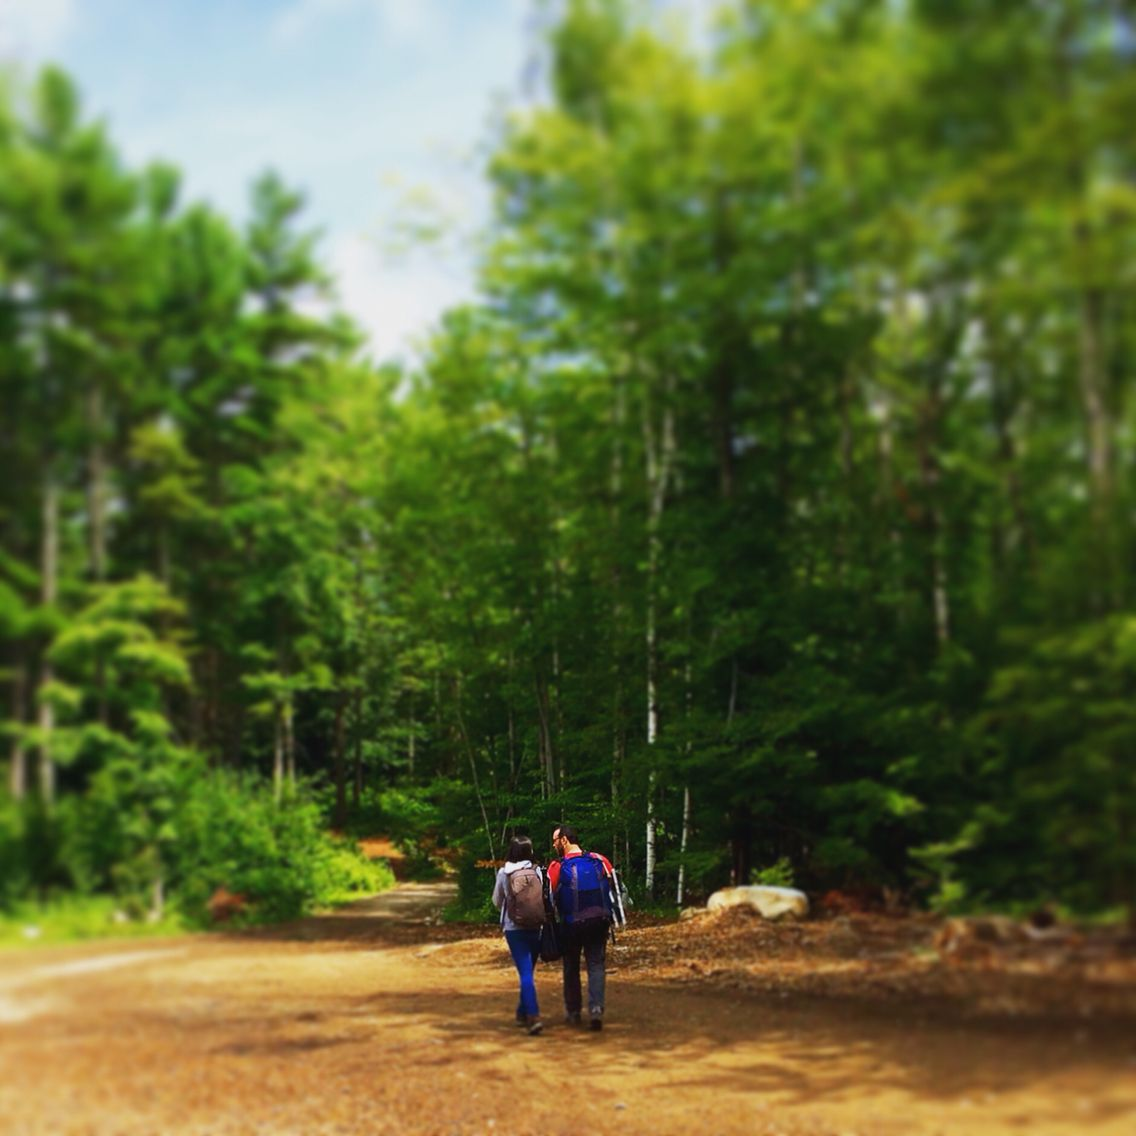 Posh Primitive Luxury Camping   Adirondack Glamping   Luxury